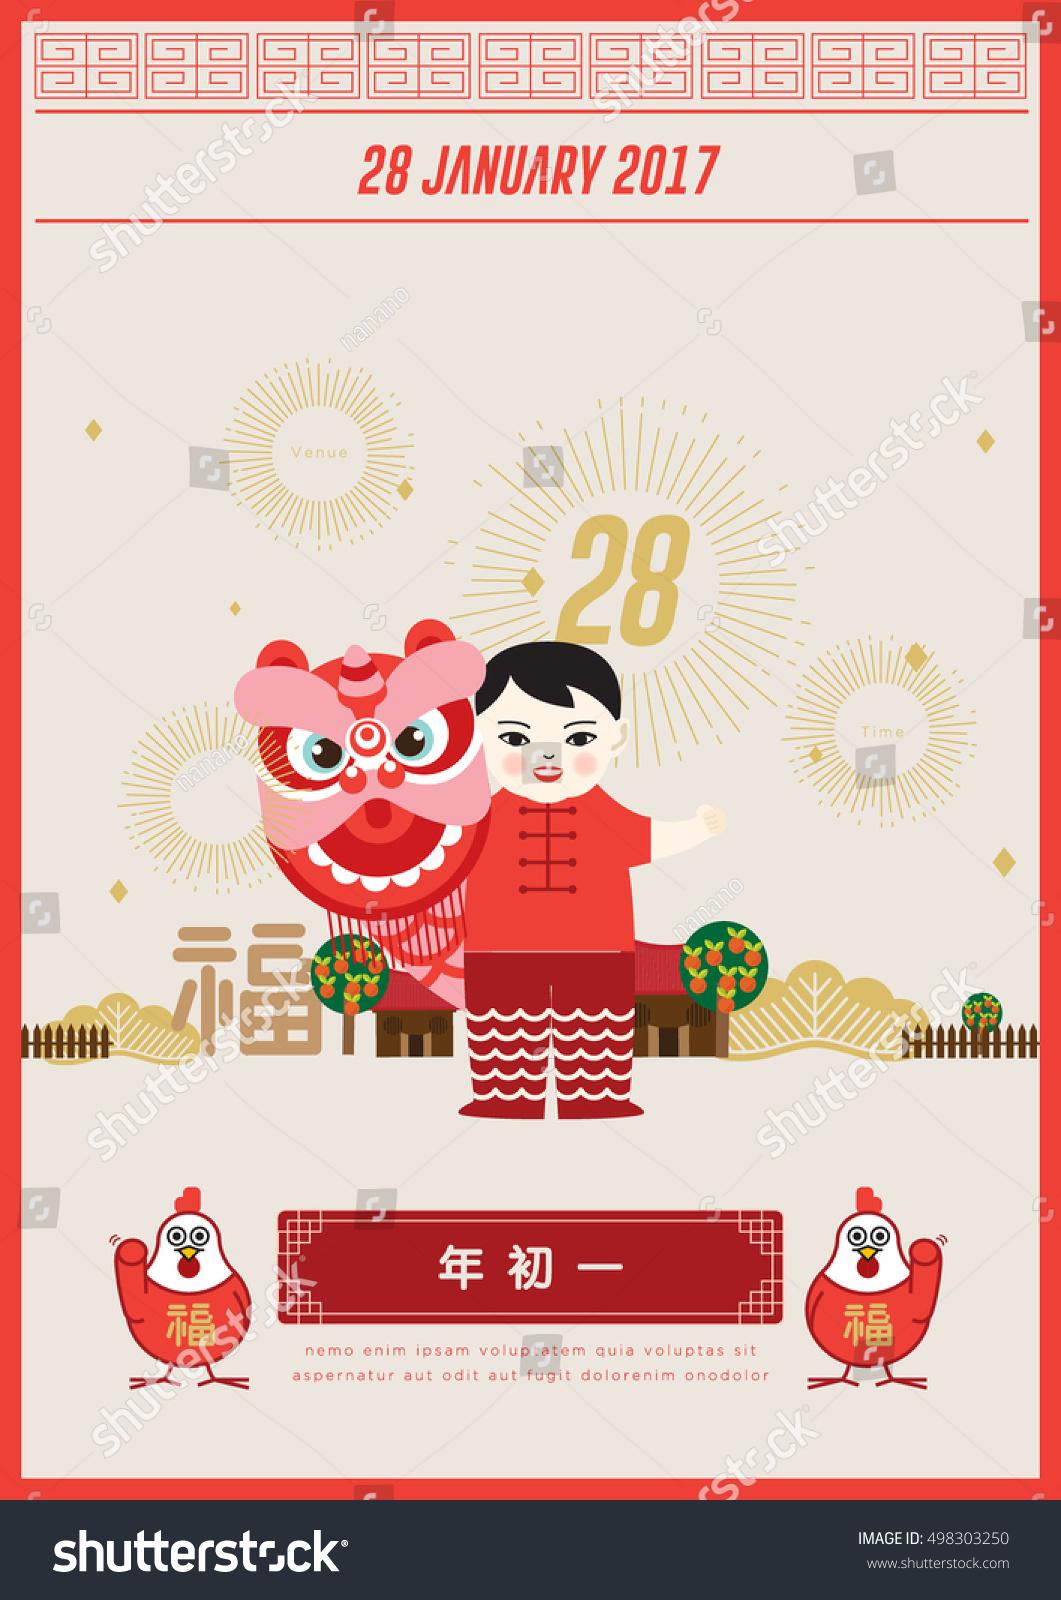 28 January 2017 Chinese Calendar Year Stock Vector Royalty Free